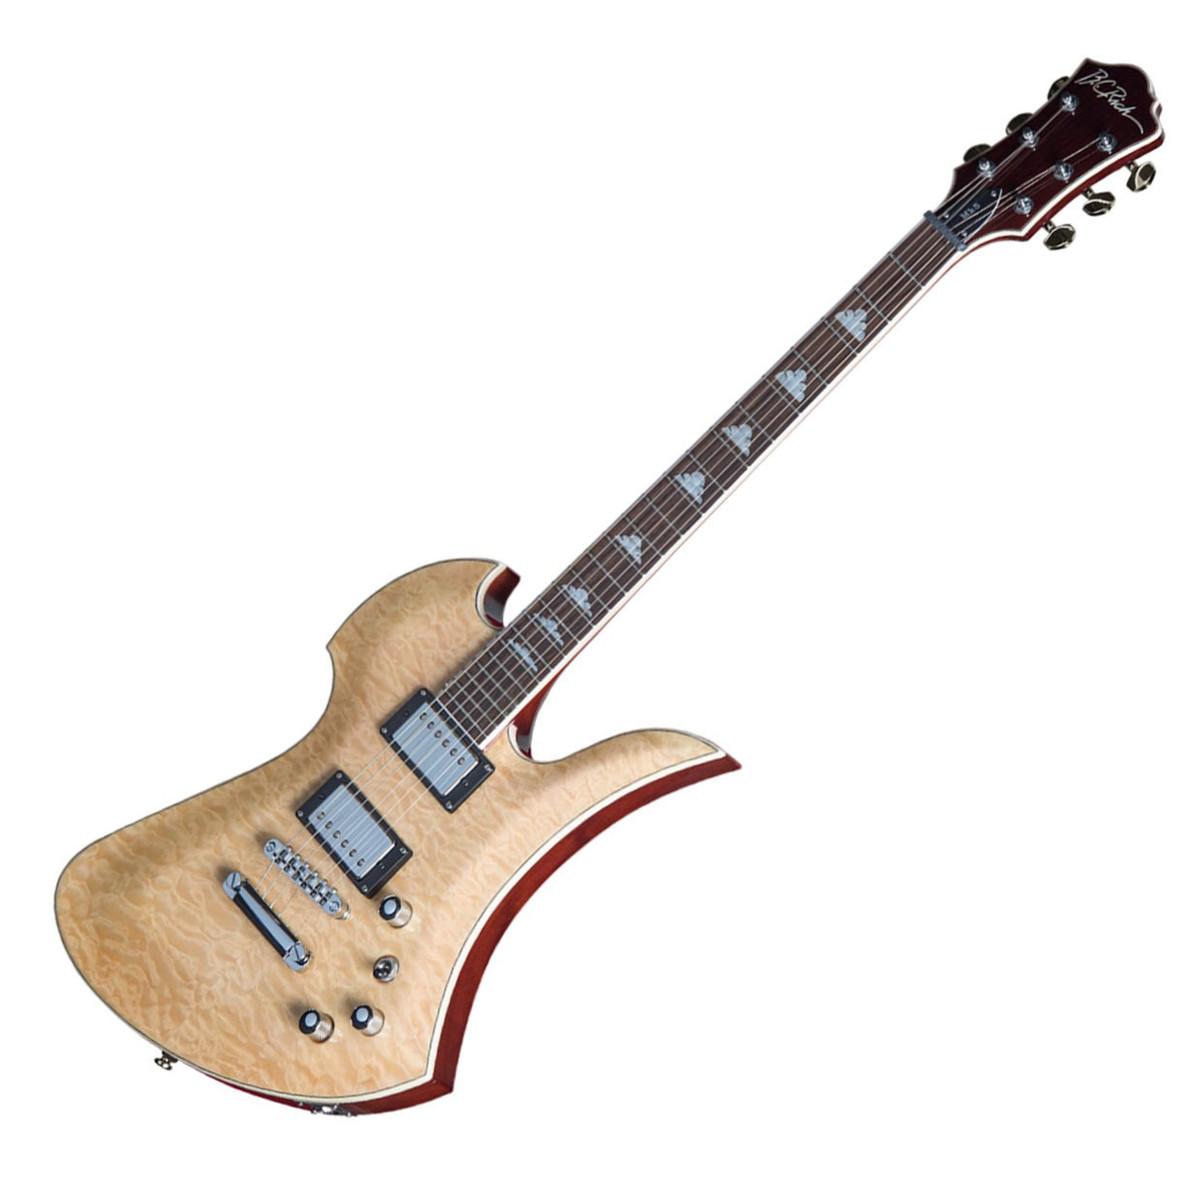 preview bc rich mockingbird mk5 electric guitar, natural at gear4music com bc rich eagle wiring diagram at bakdesigns.co